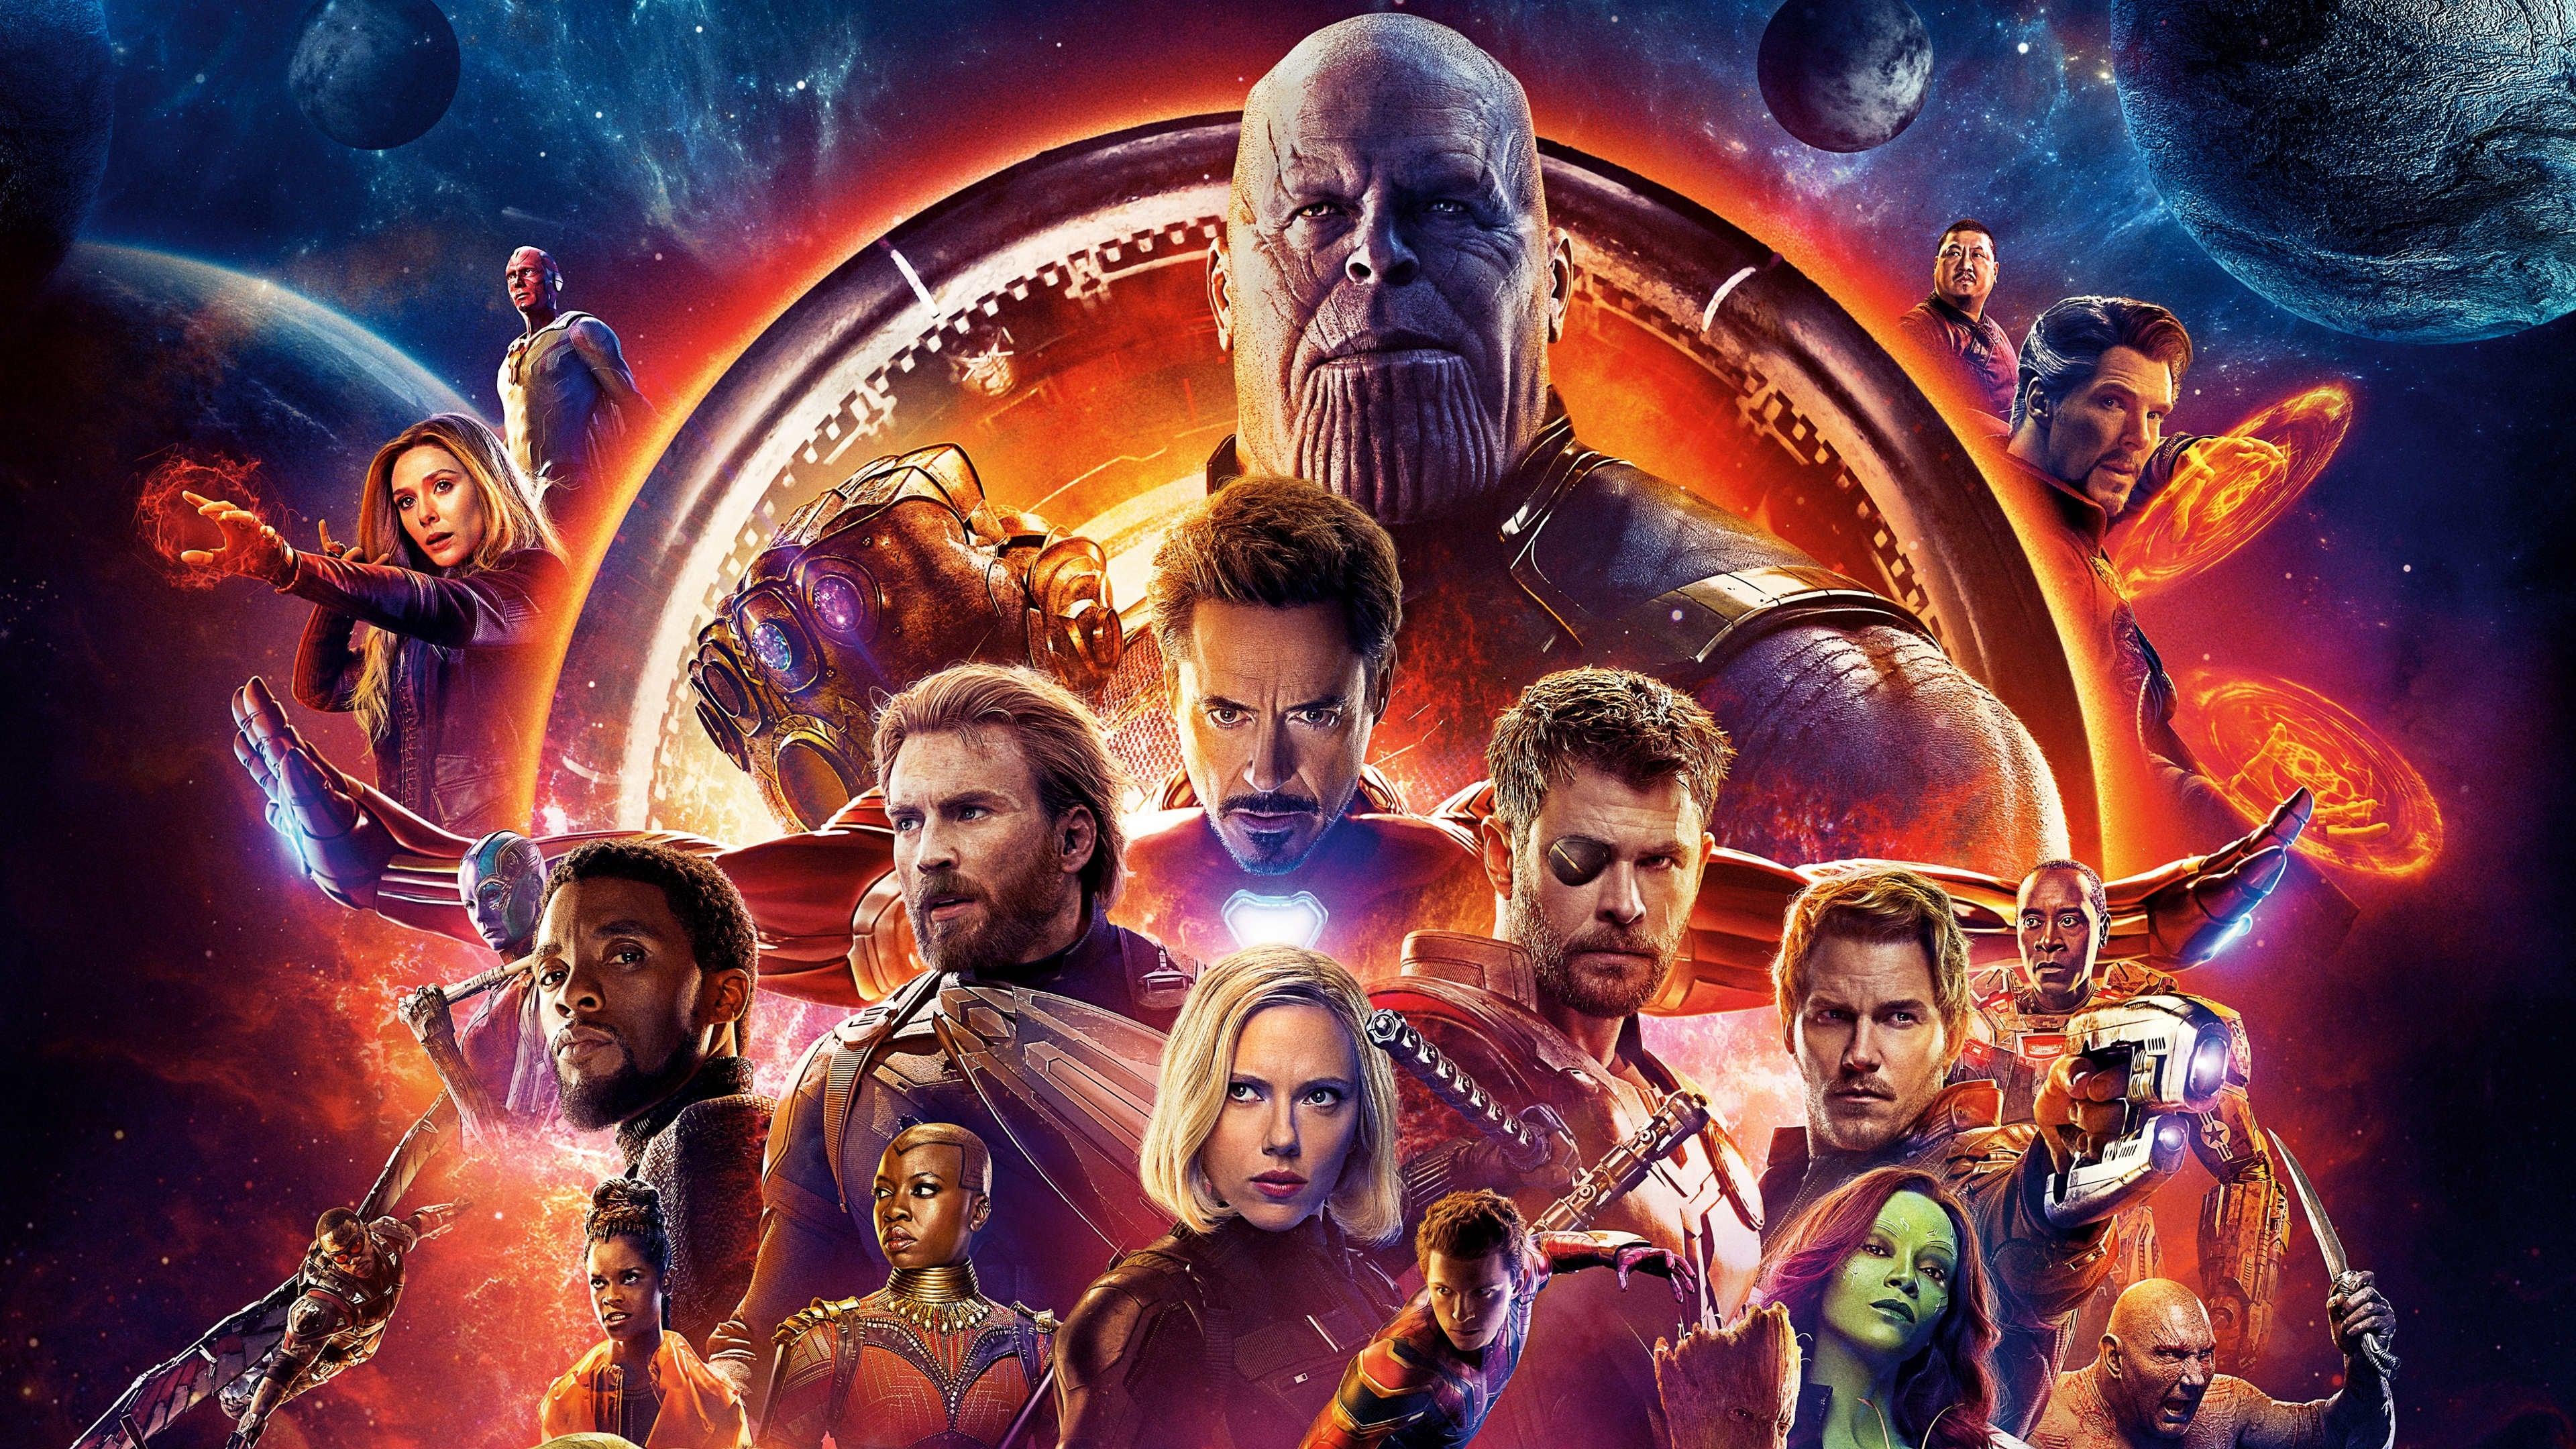 Watch Avengers: Infinity War 2018 Movies